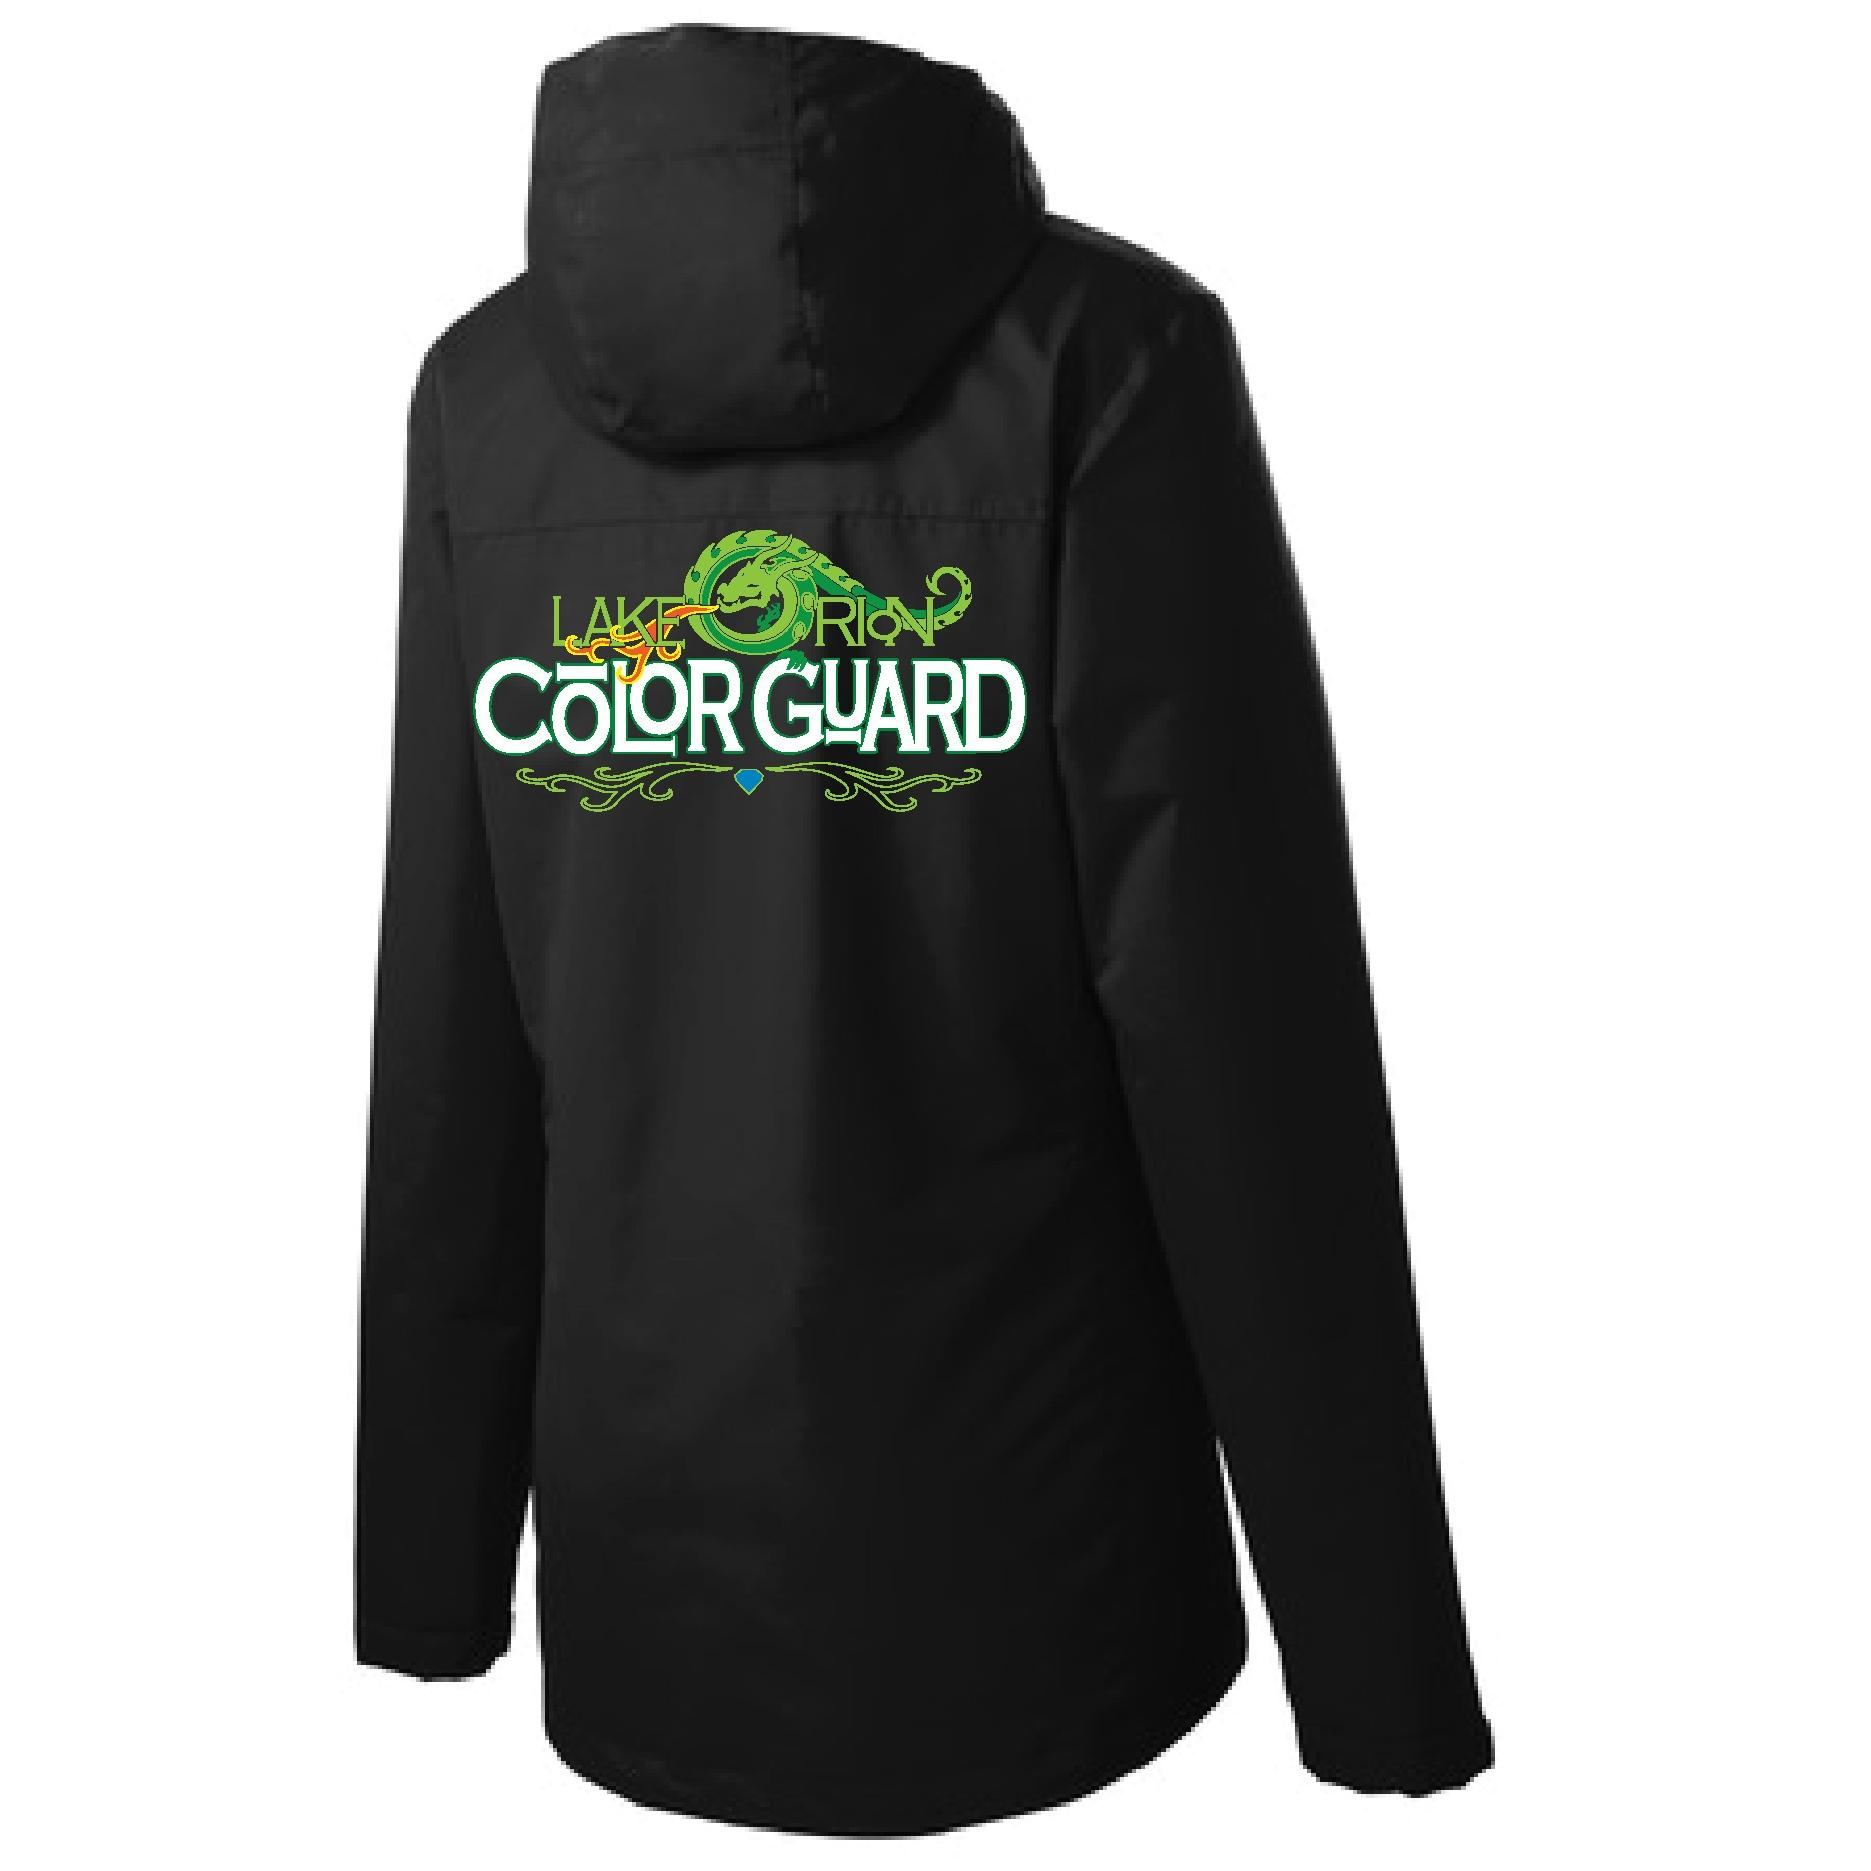 Guard Jacket Ladies Back Cloffy.jpg